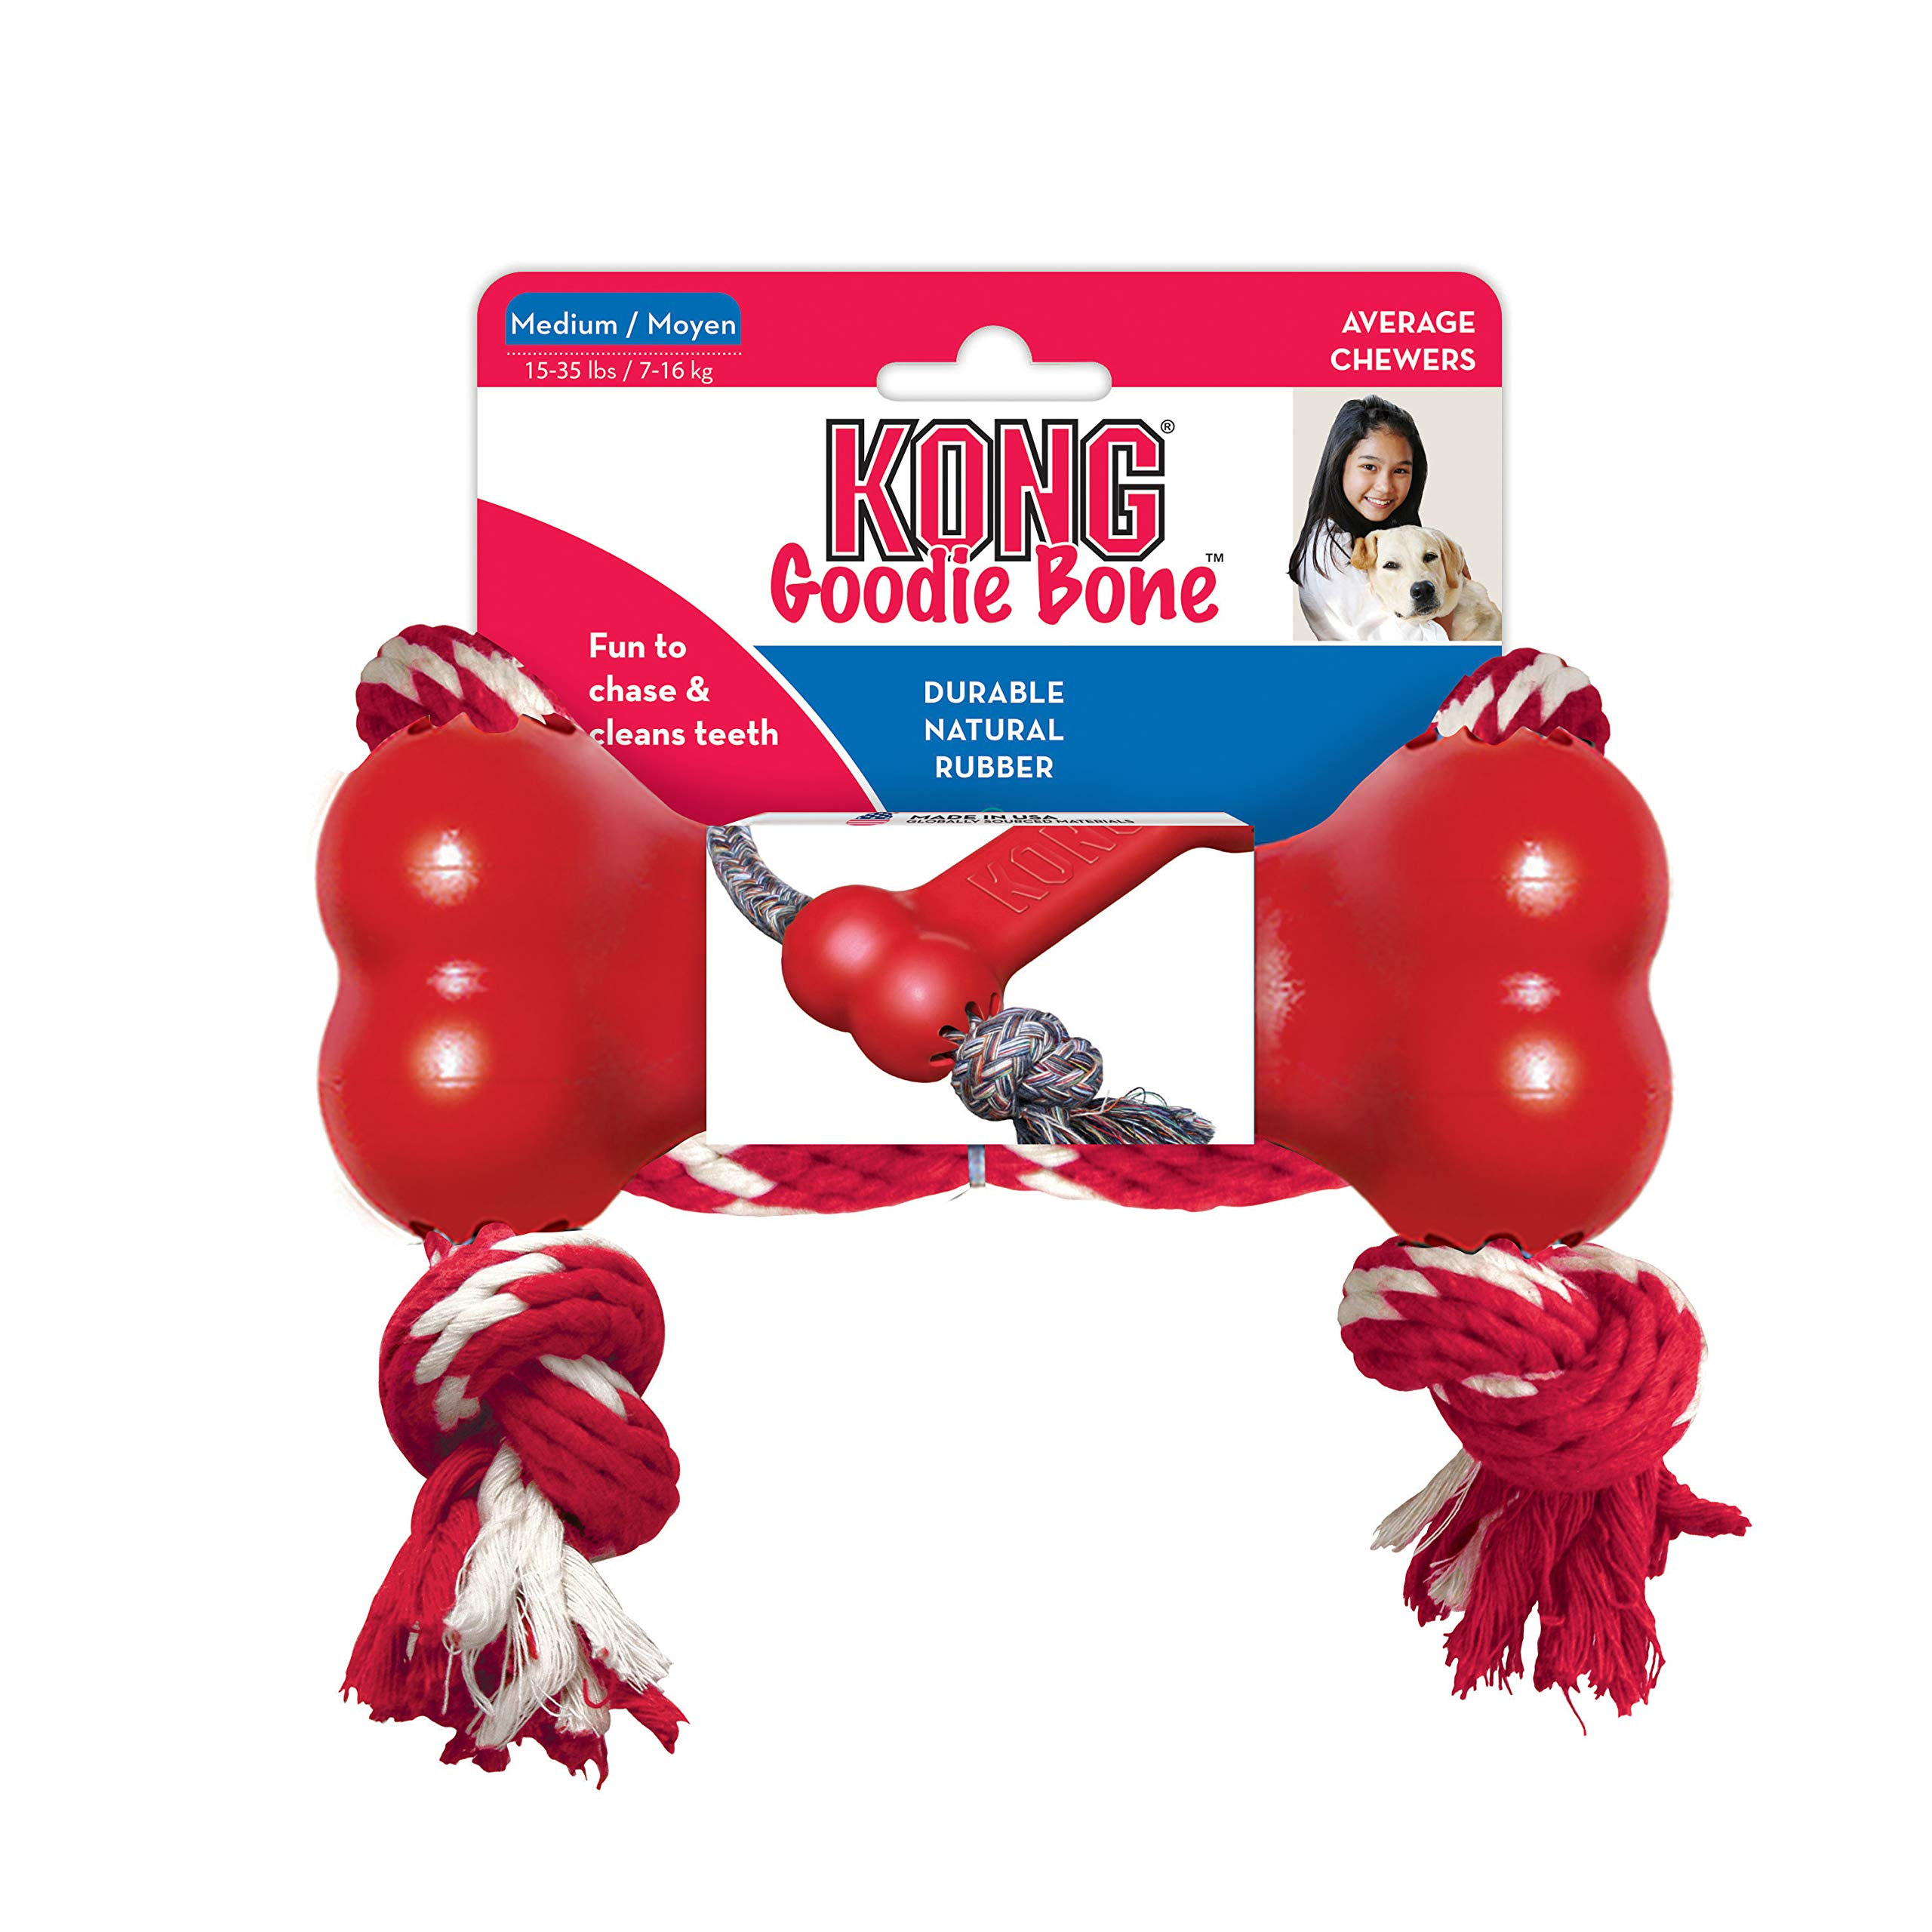 KONG Goodie Bone with Rope, Medium